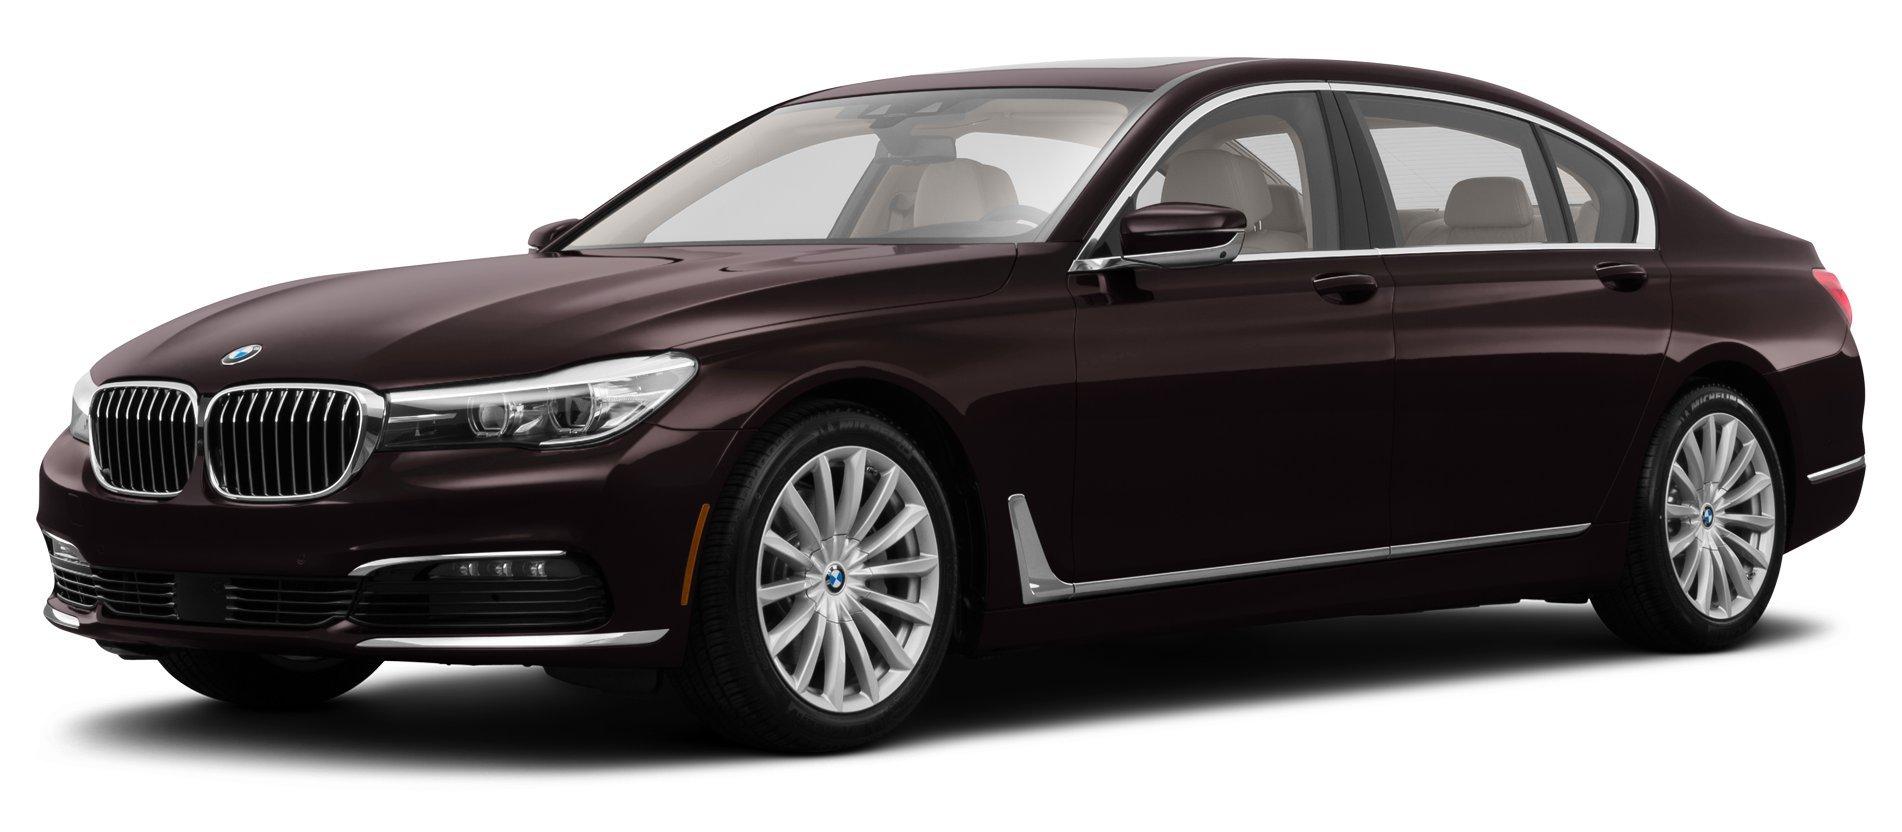 2016 Bmw 740i Reviews Images And Specs Vehicles Modified 740li 4 Door Sedan Rear Wheel Drive